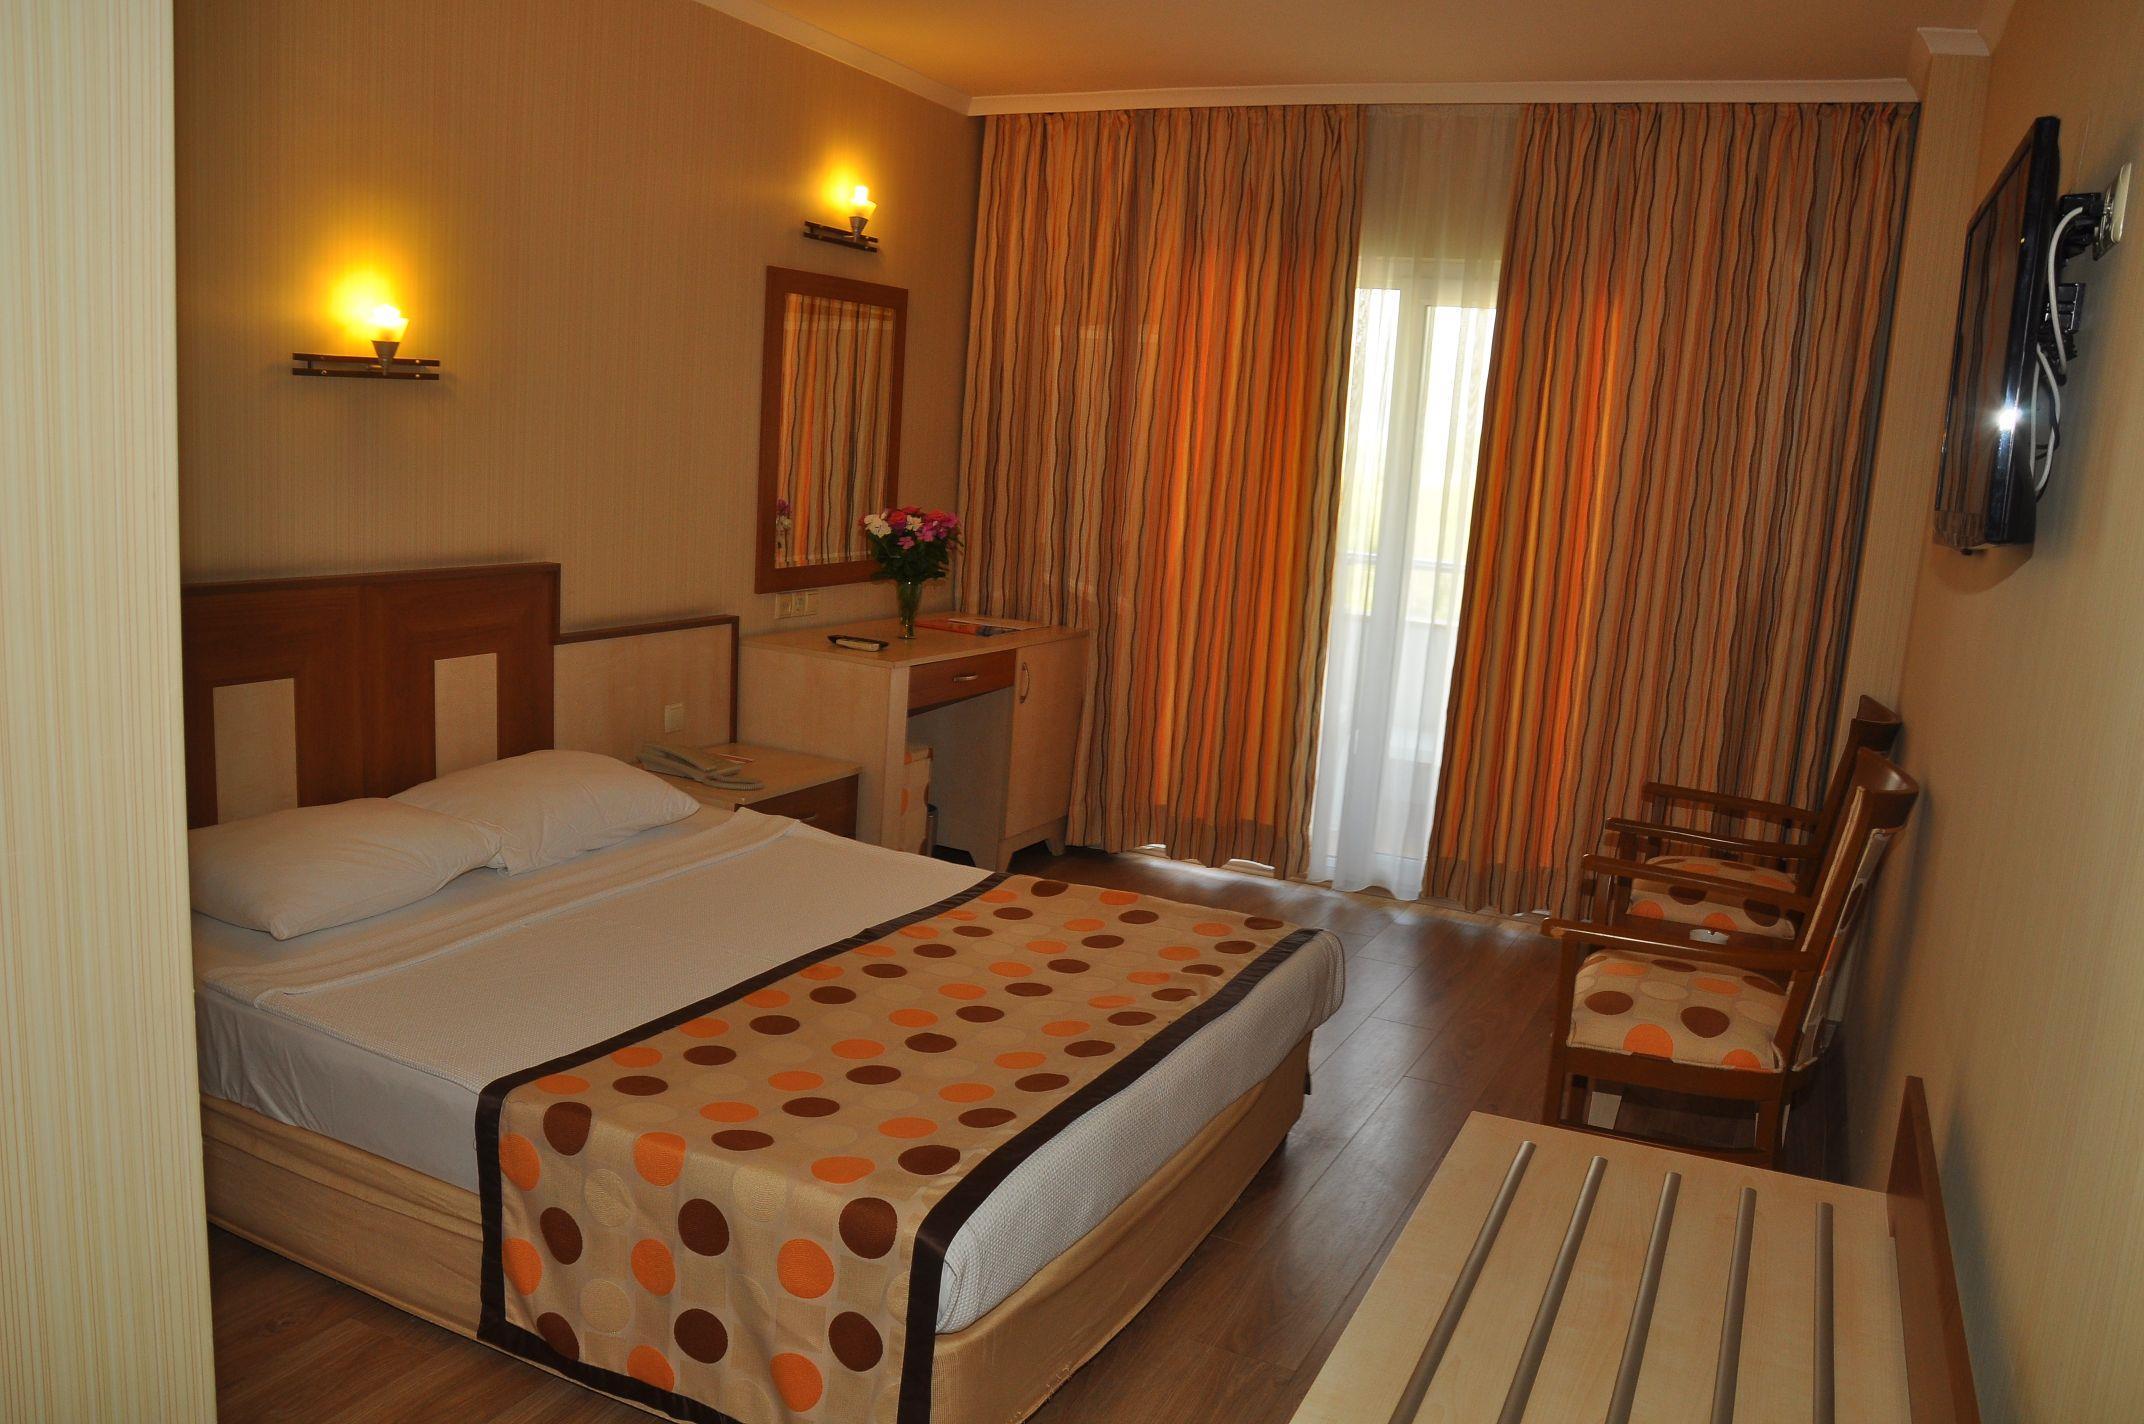 http://www.orextravel.sk/OREX/hotelphotos/stella-beach-hotel-alanya-general-006.jpg